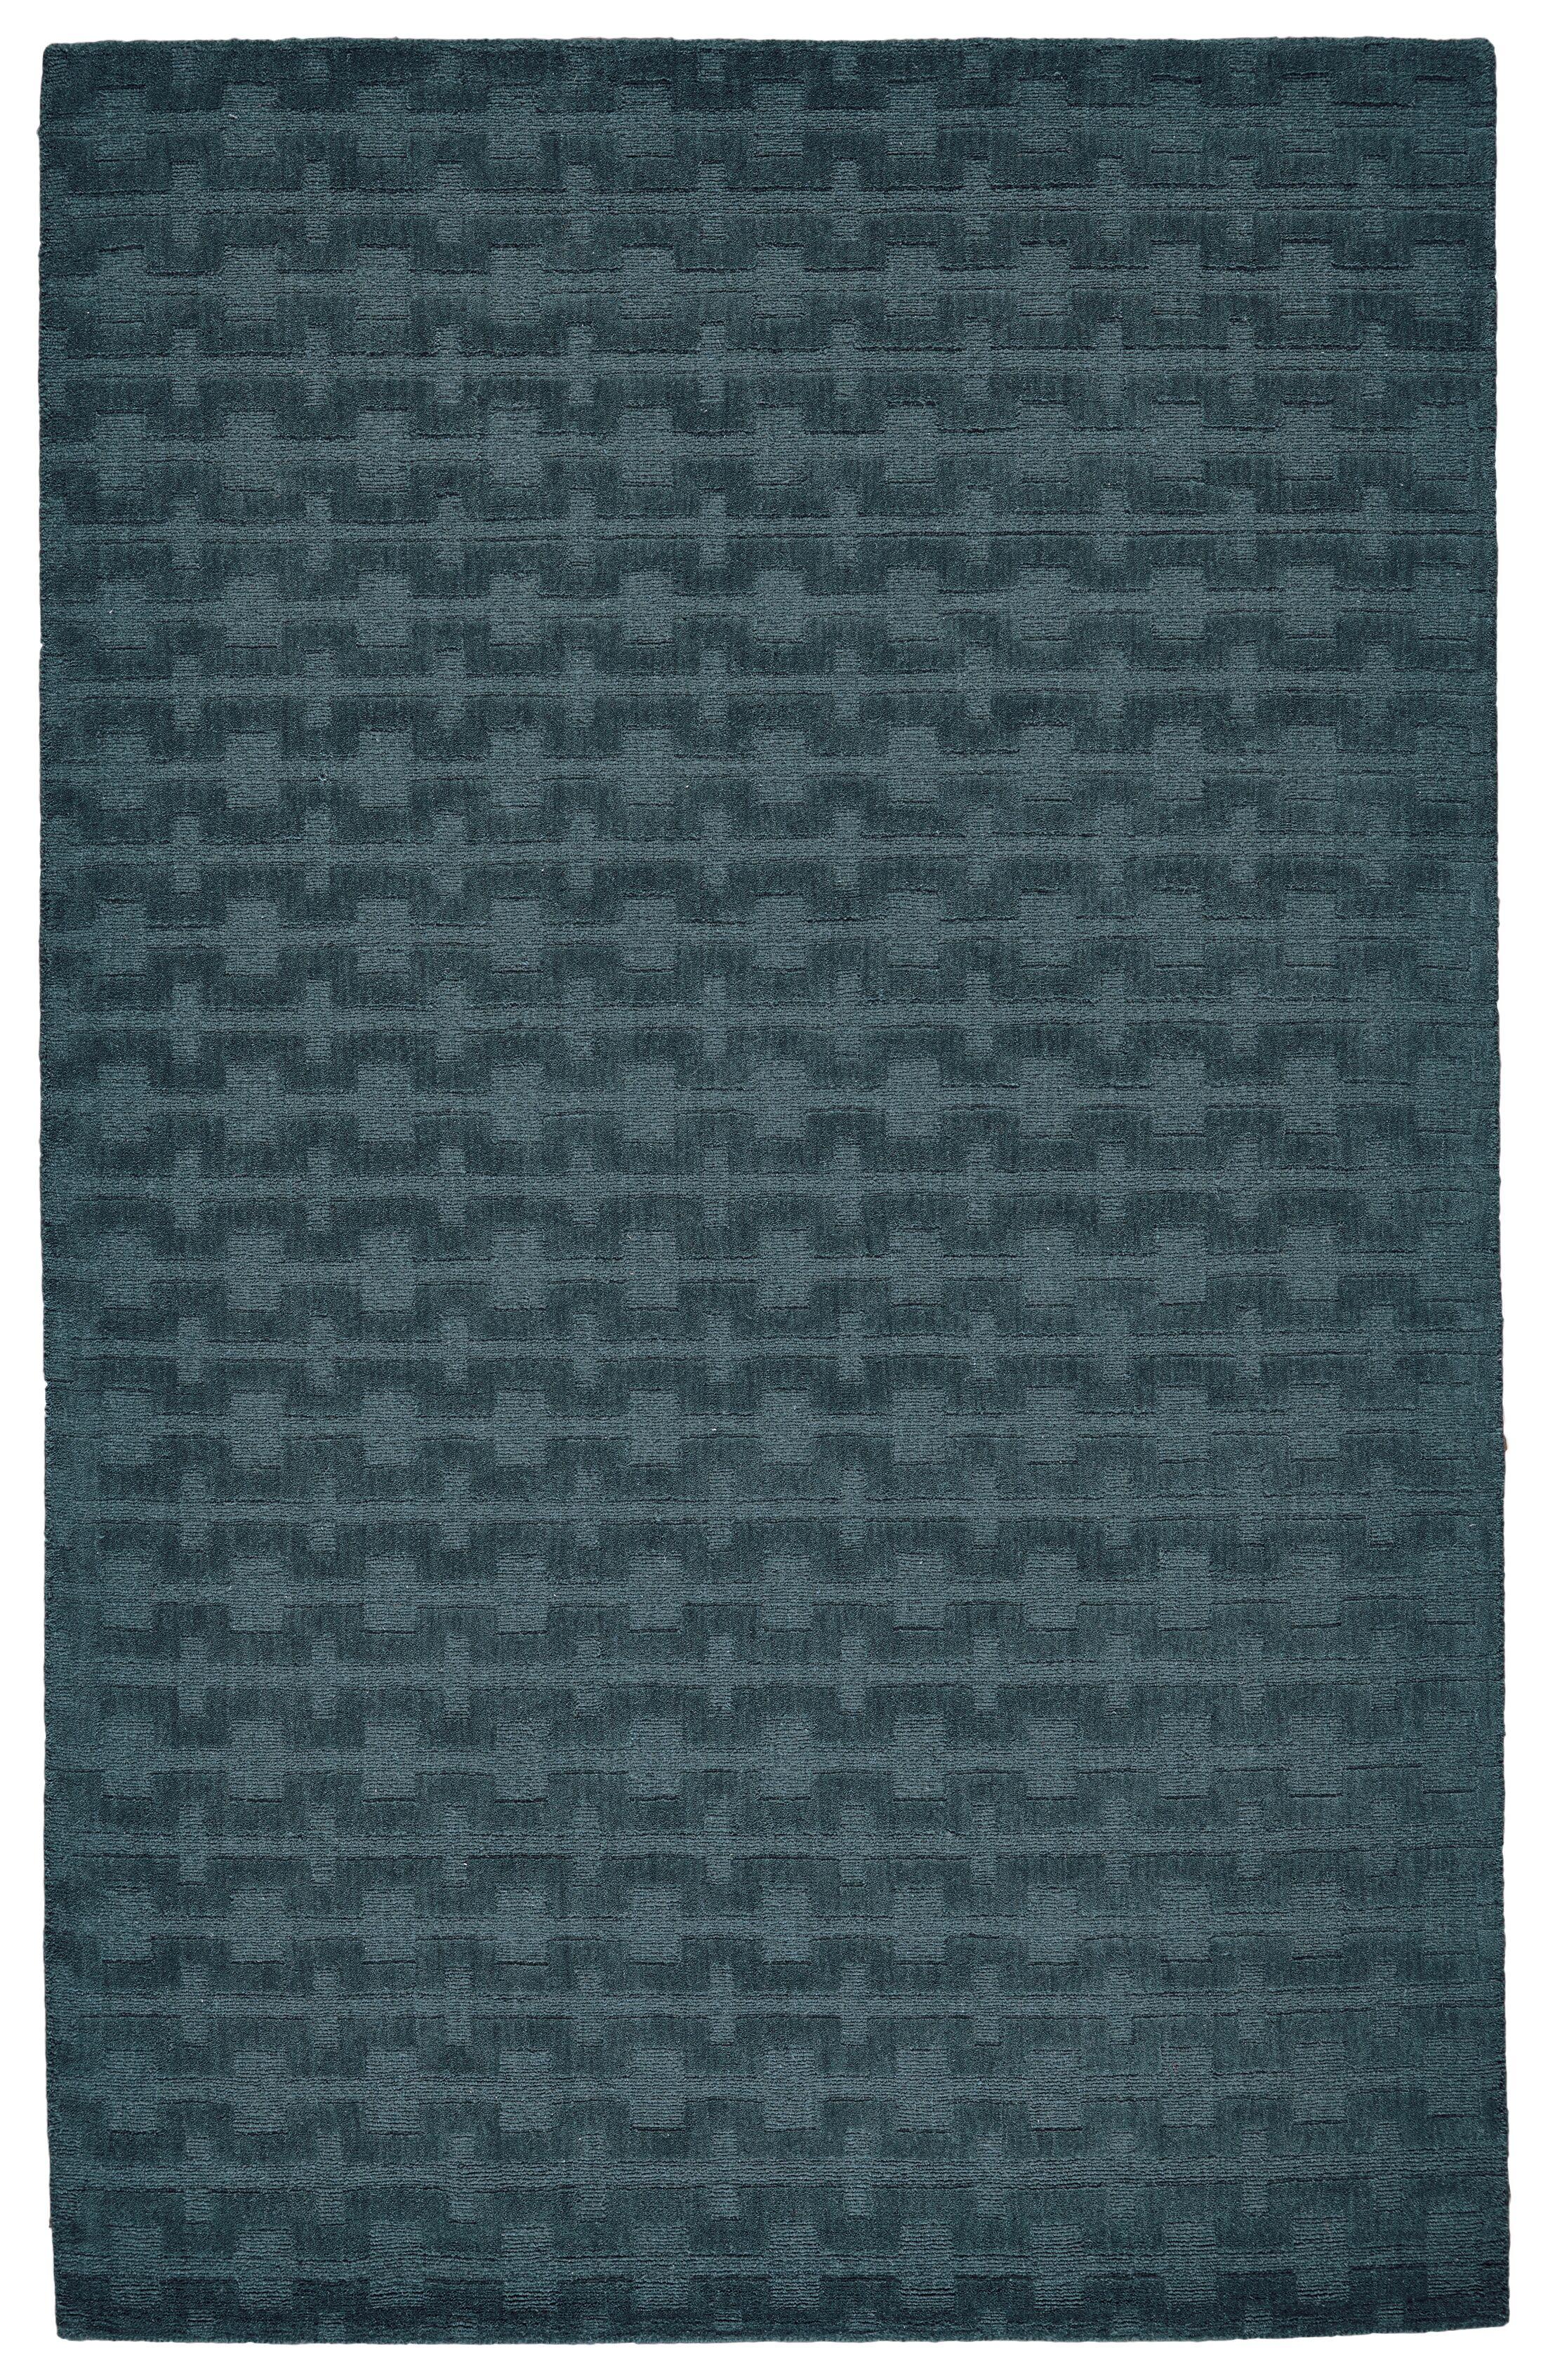 Mcnab Hand-Tufted Wool Teal Area Rug Rug Size: Rectangle 8' x 11'